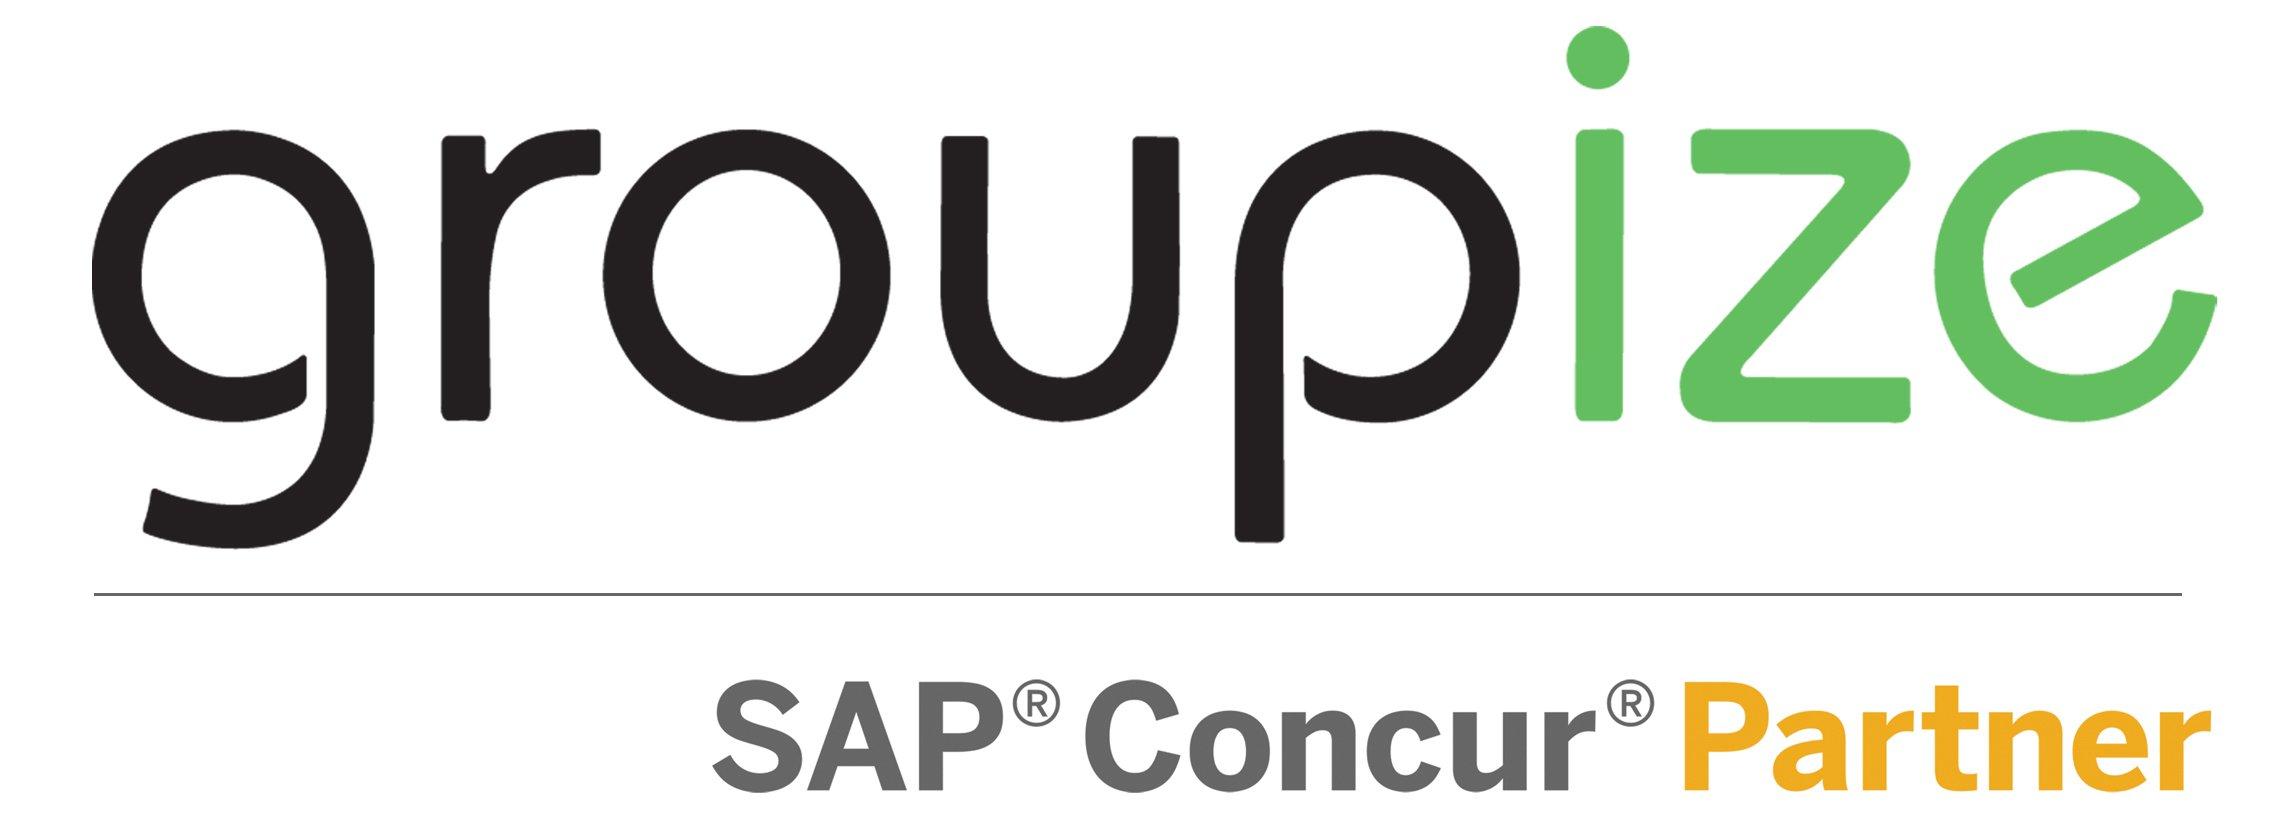 groupize concur partner logo